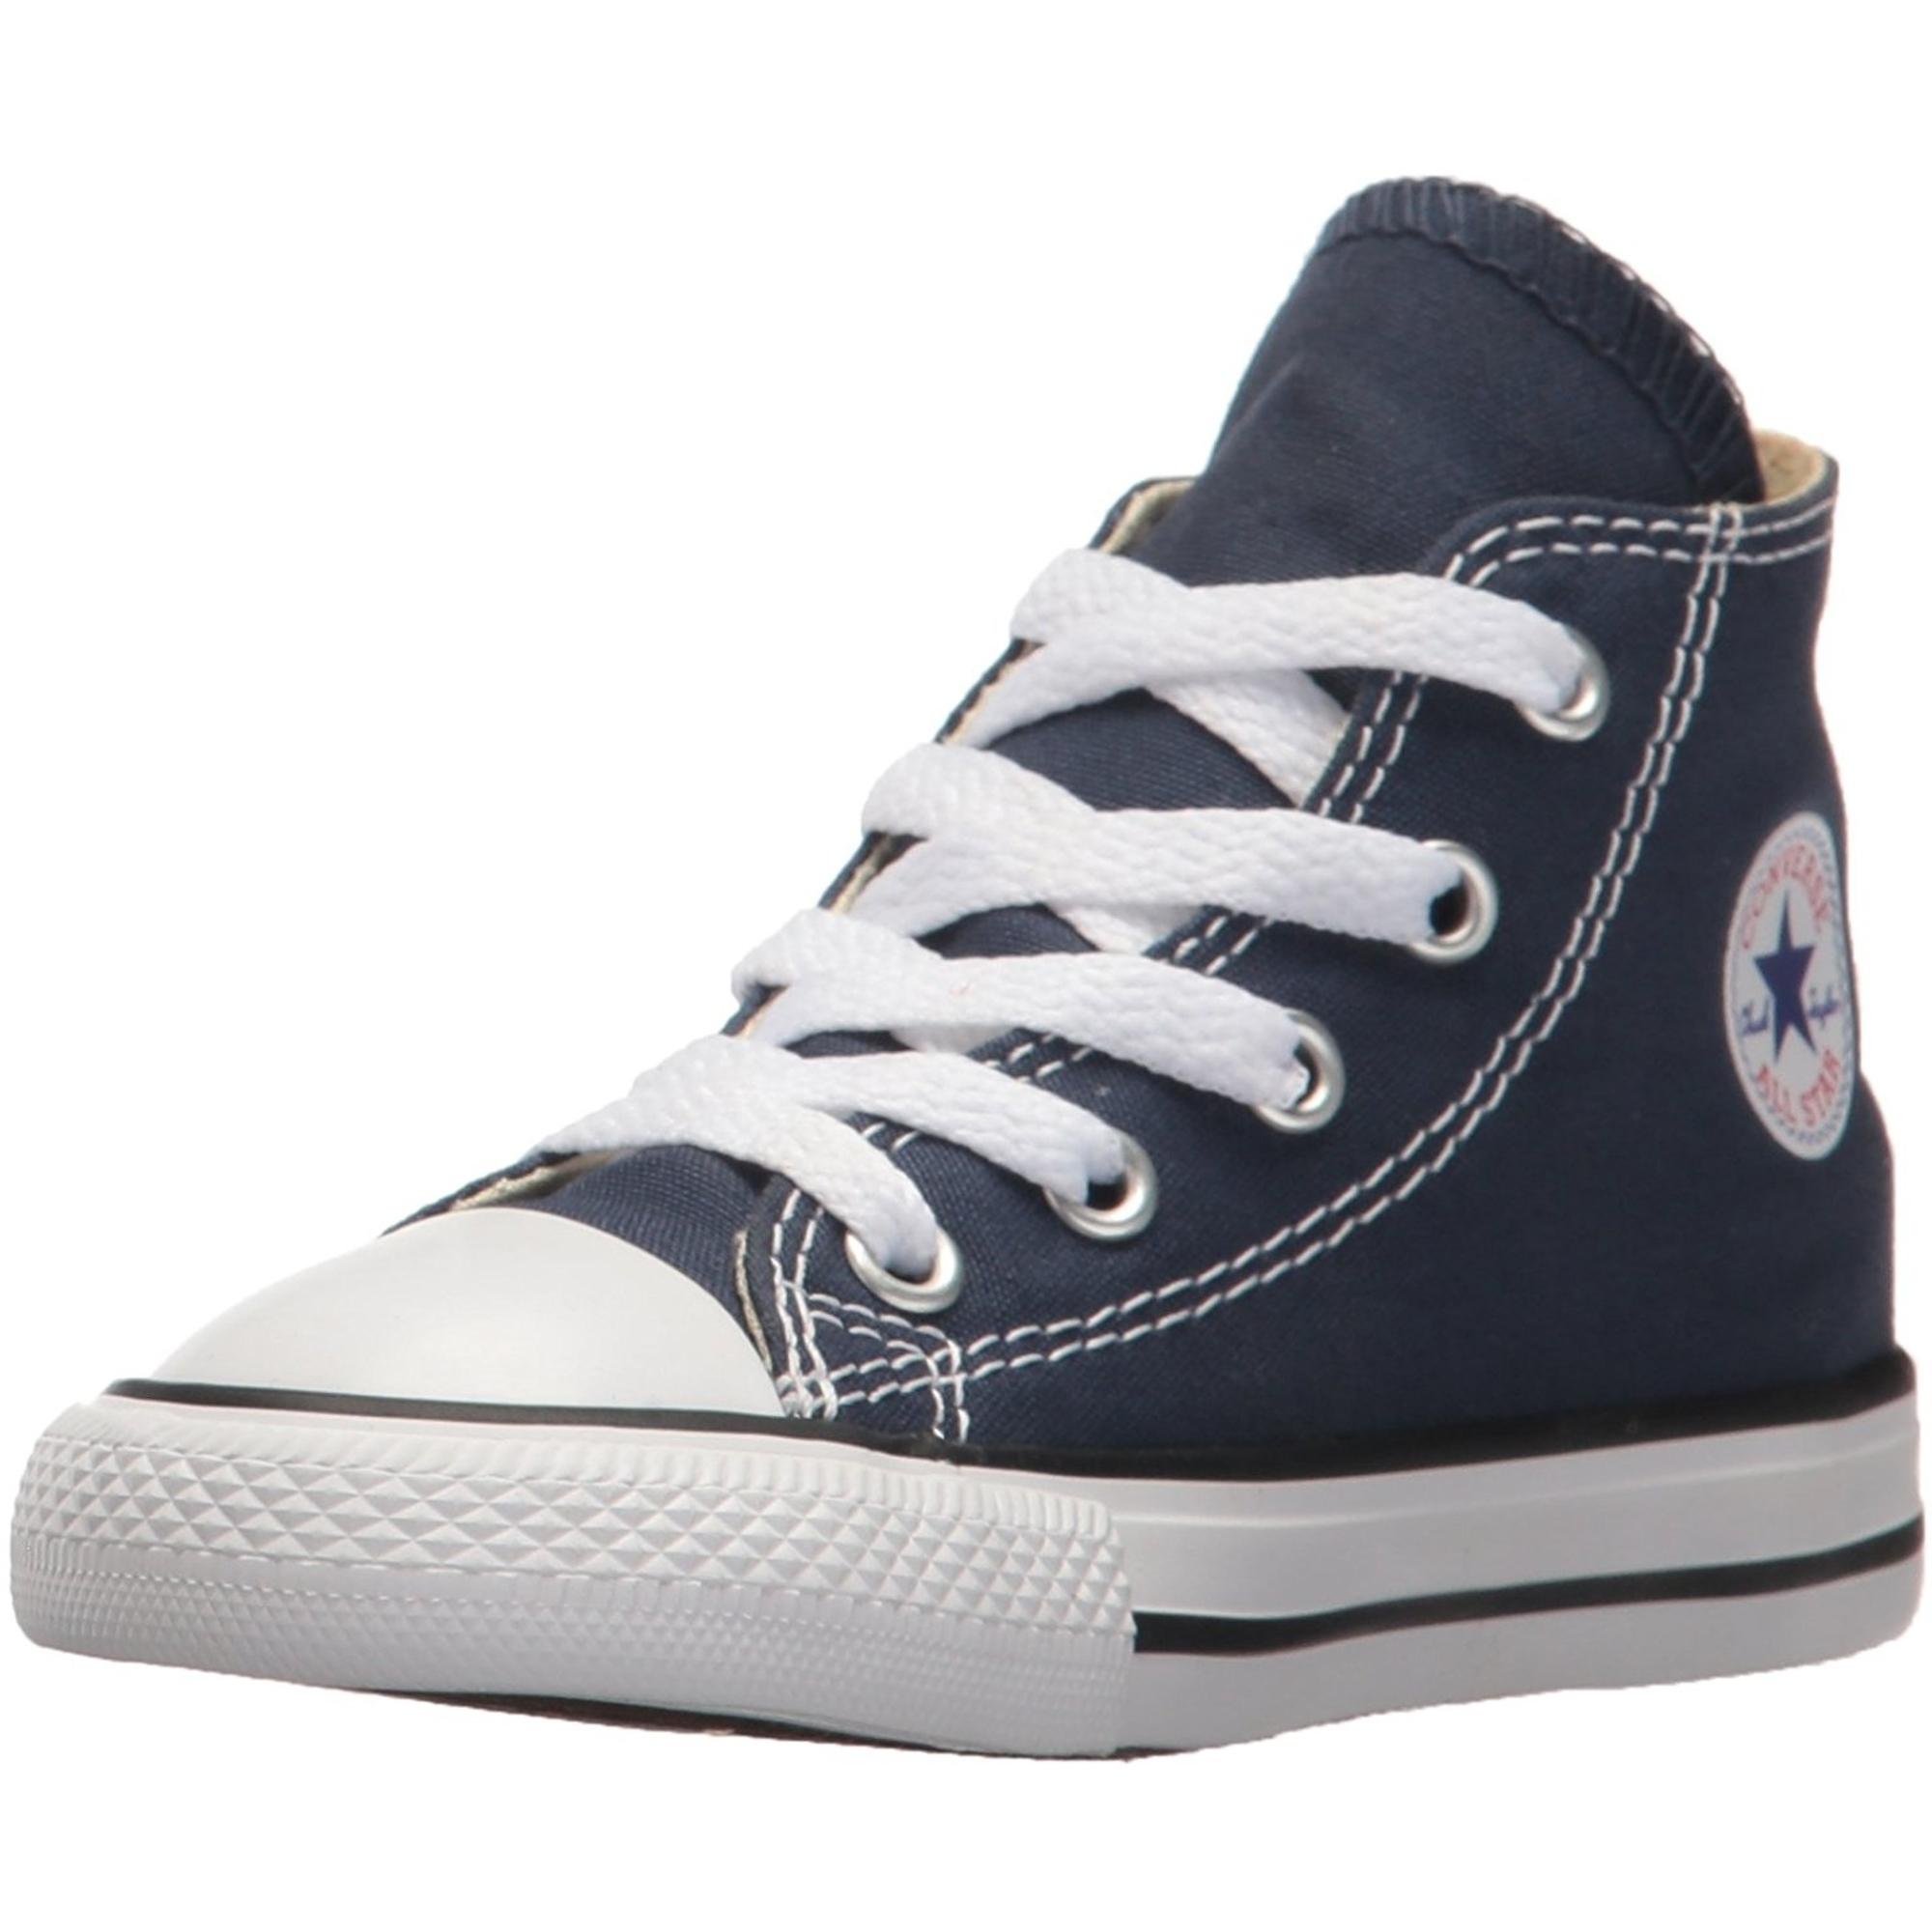 Converse Chuck Taylor All Star Hi Dark Navy Textil Baby